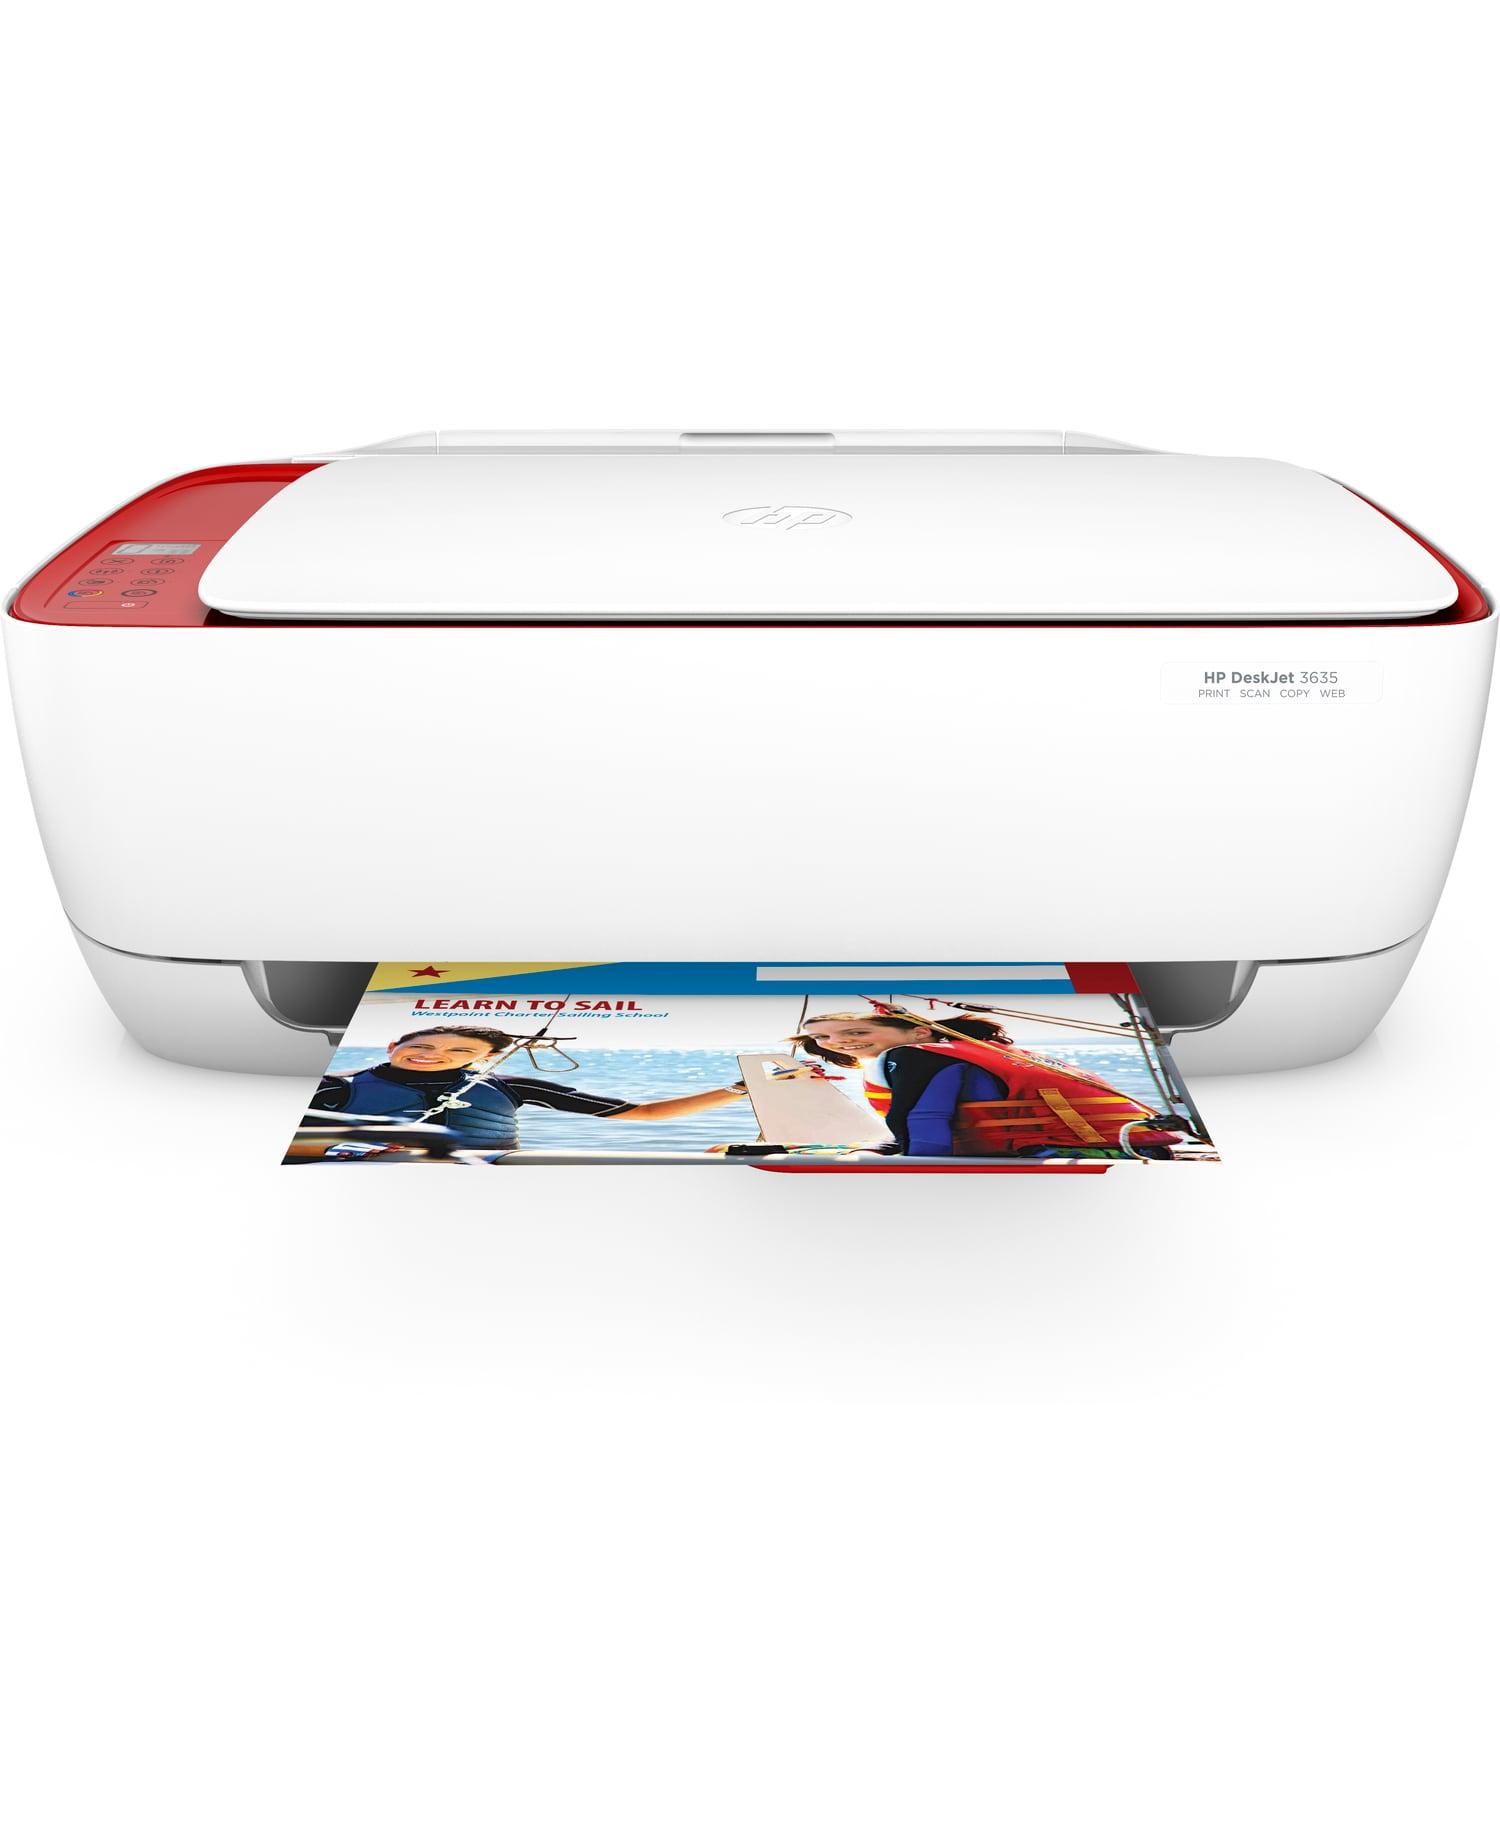 HP DeskJet 3630 Series All in One Wireless Printer ...